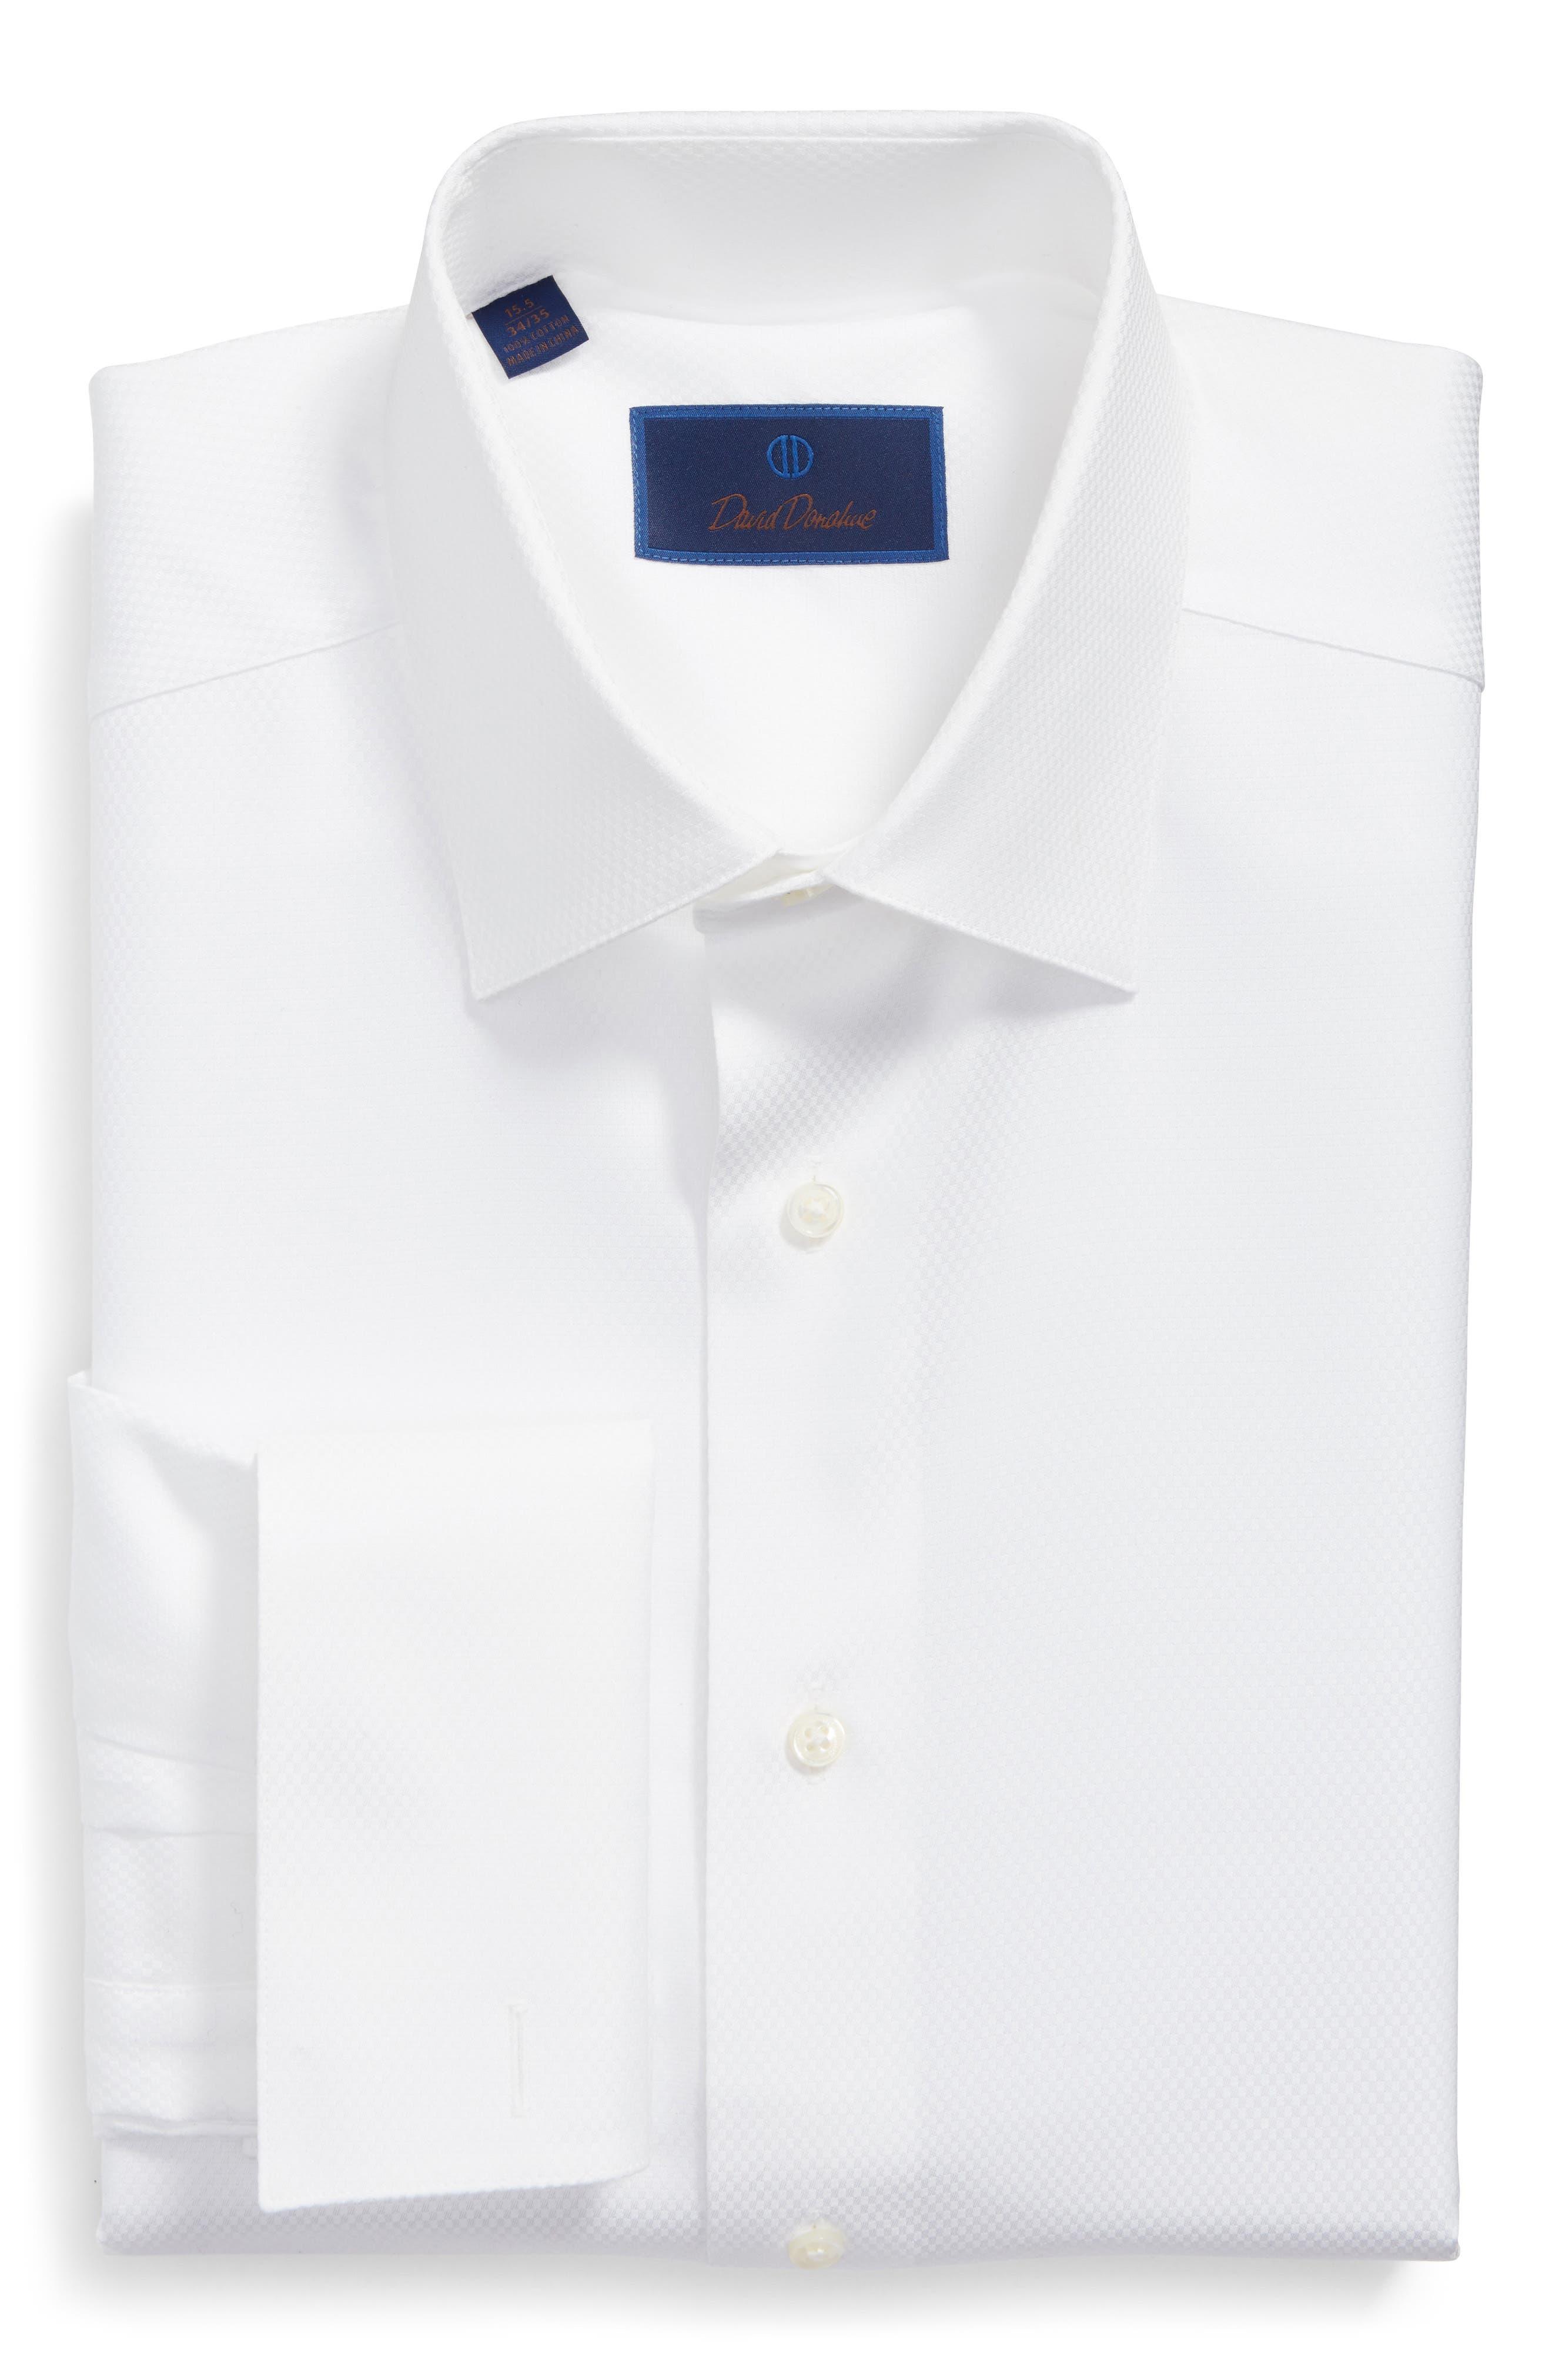 Main Image - David Donahue Regular Fit Solid French Cuff Tuxedo Shirt